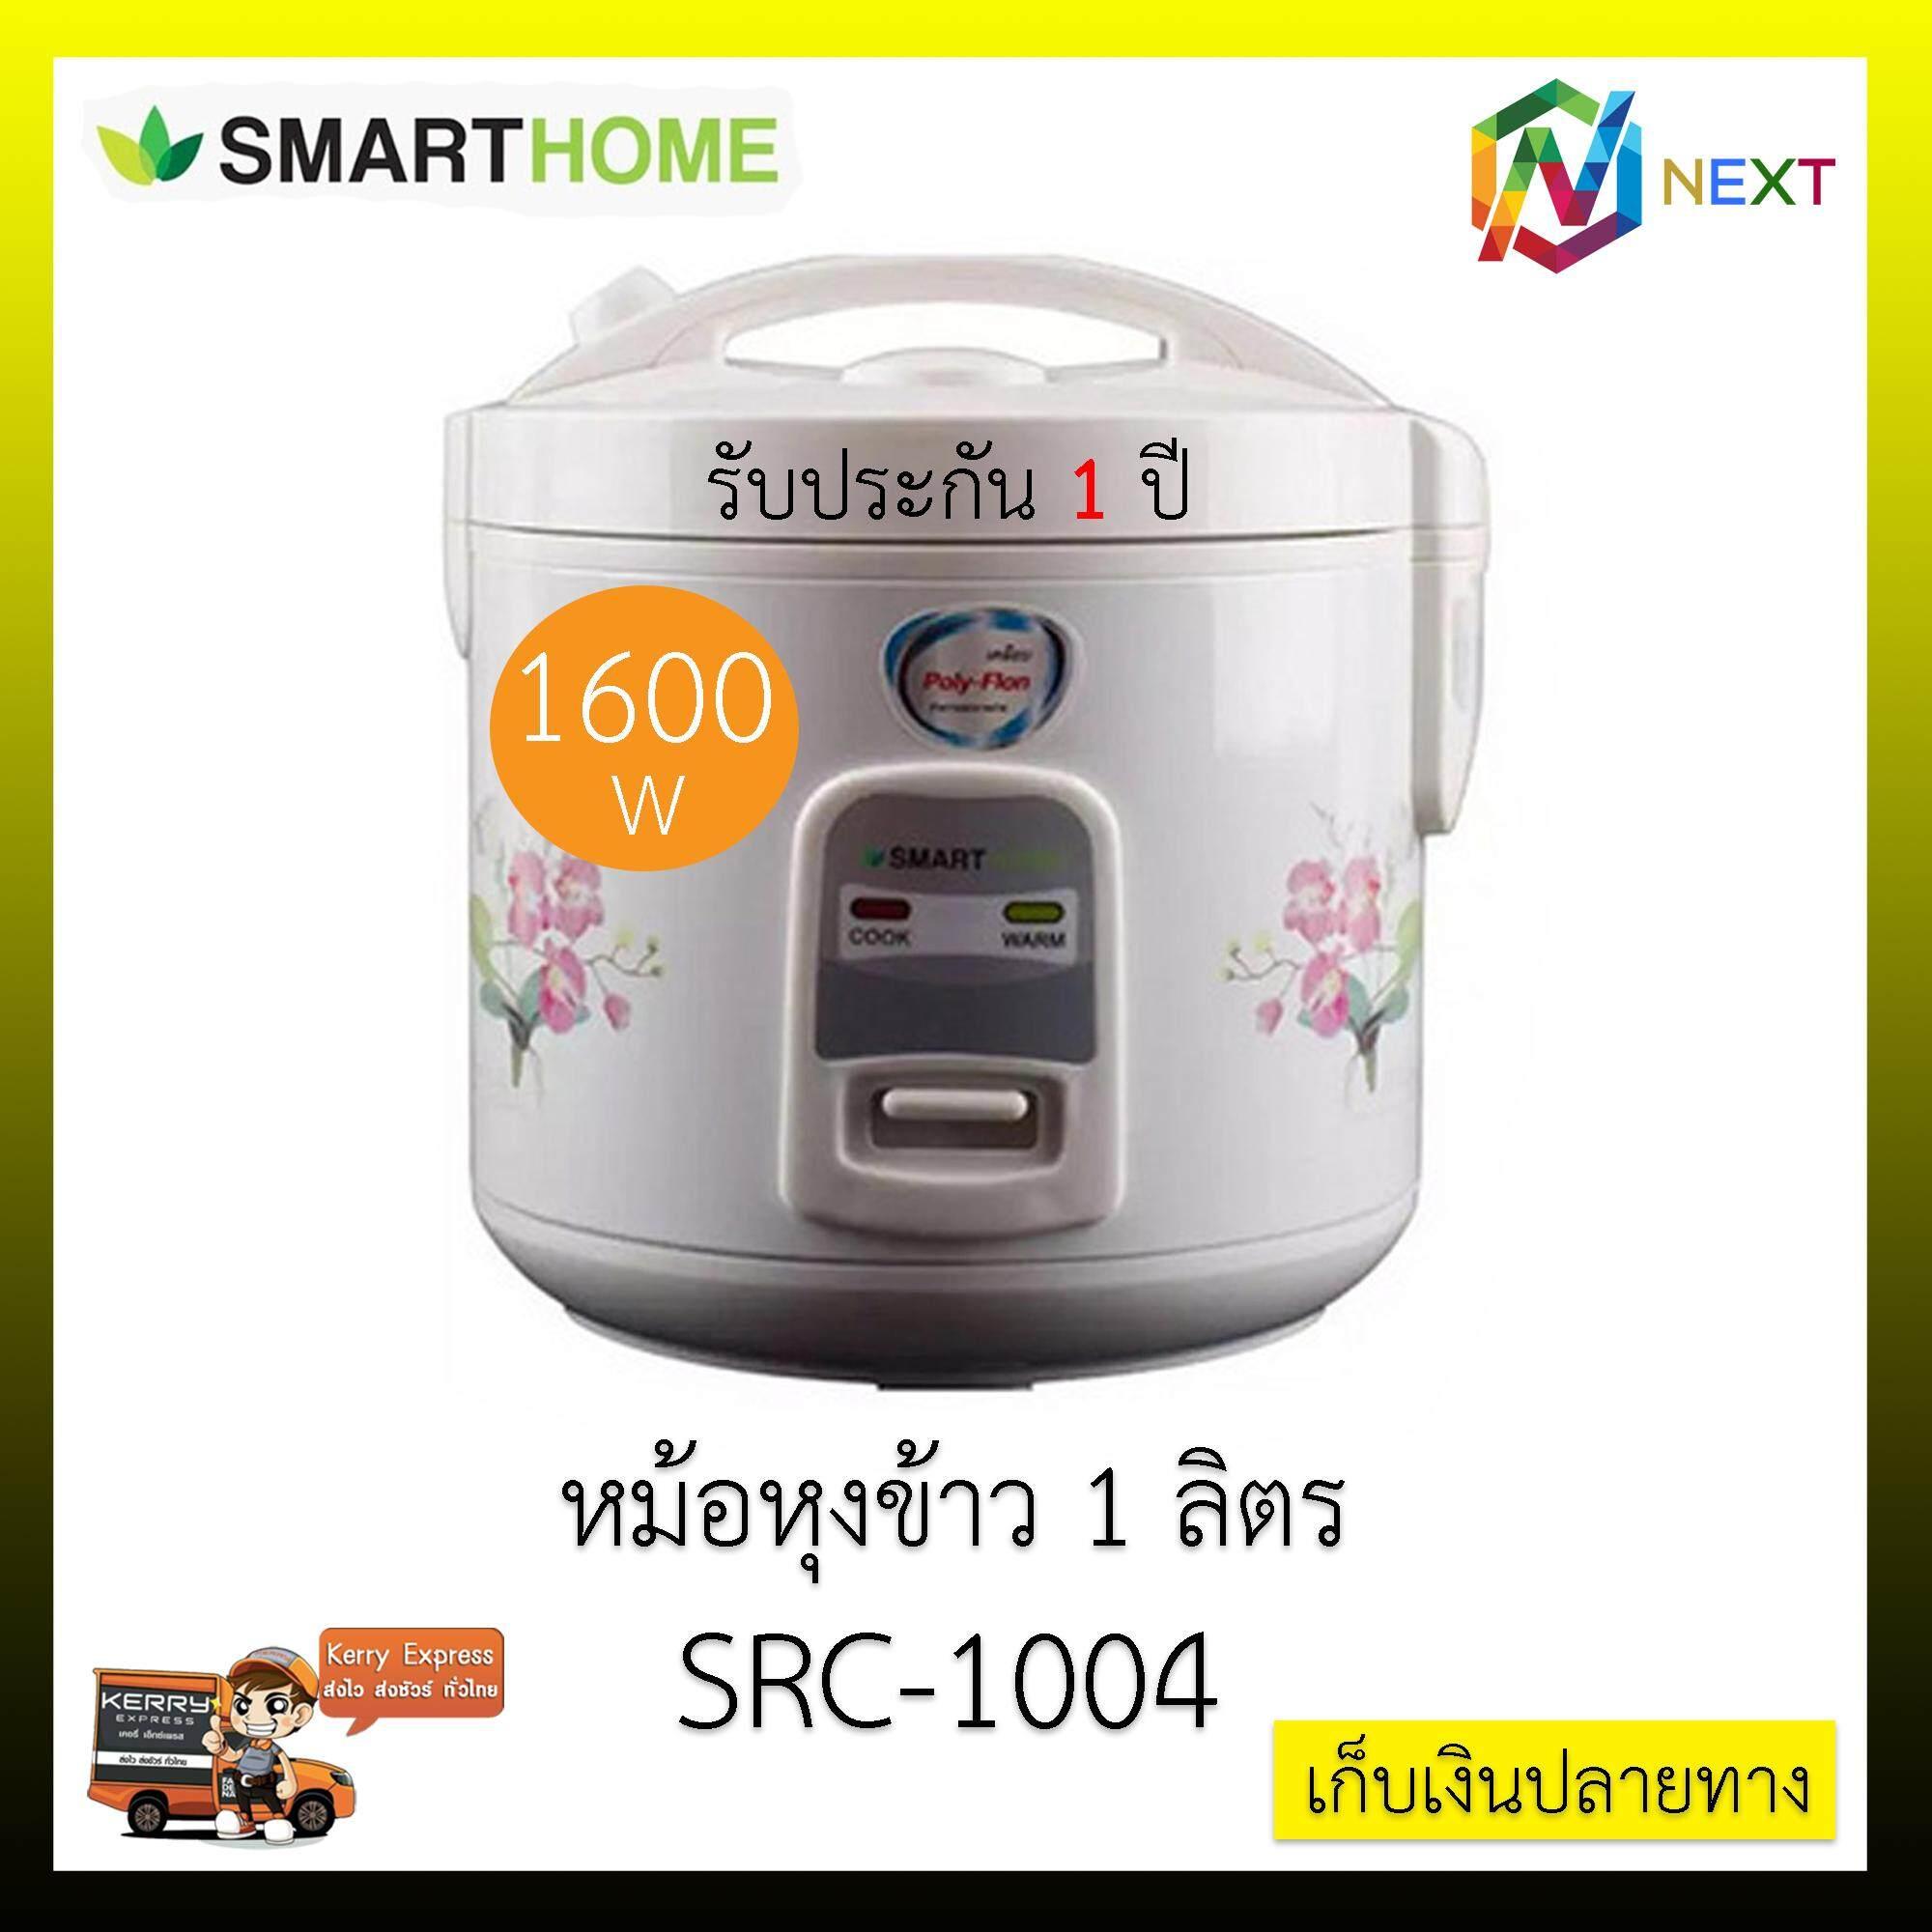 Smarthome หม้อหุงข้าว 1L รุ่น SRC-1004